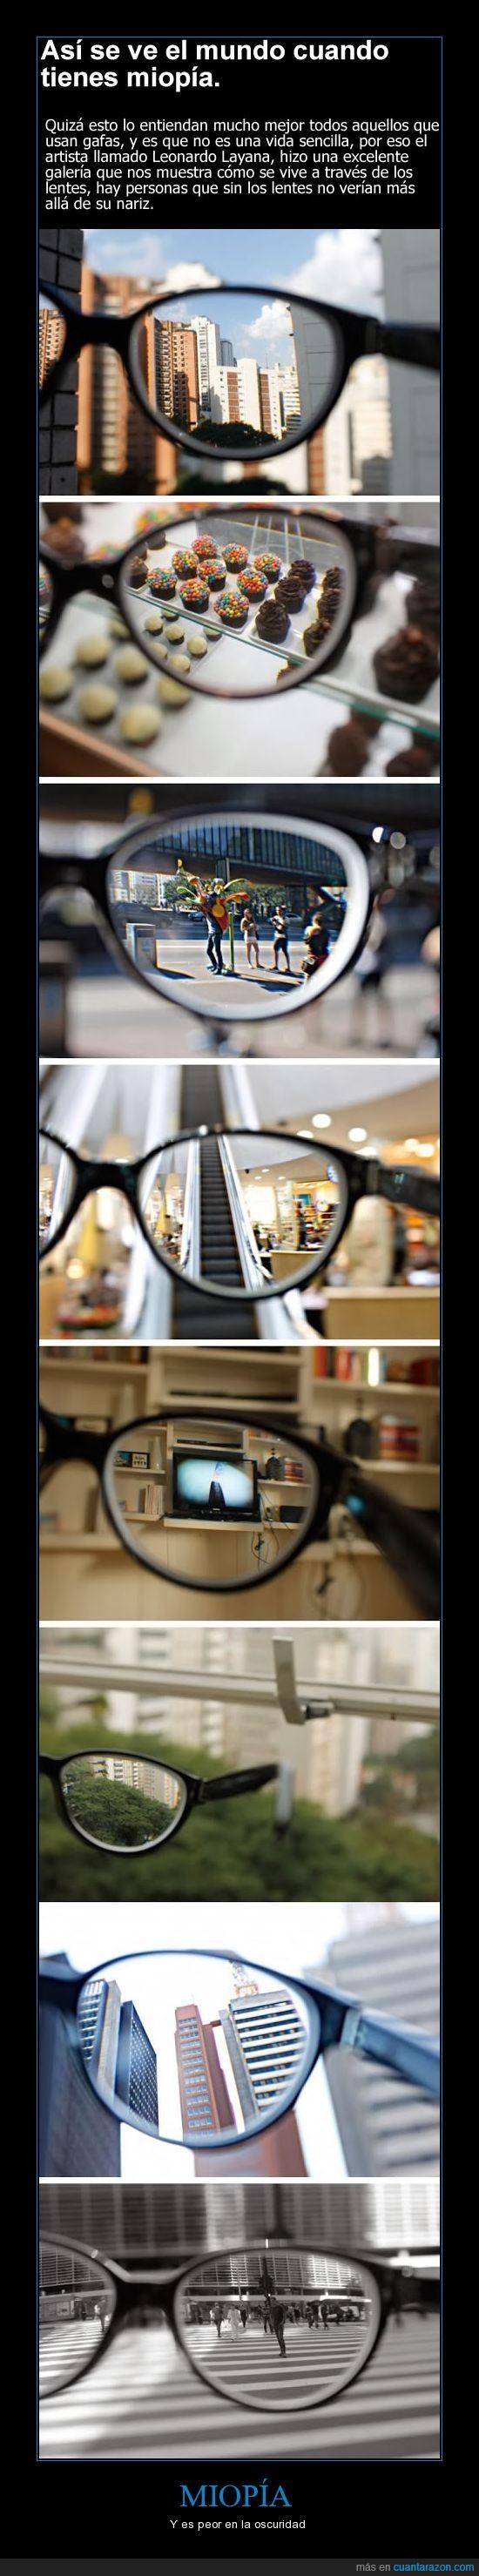 borroso,ciego,gafas,lentes,miopía,zapatos de otro